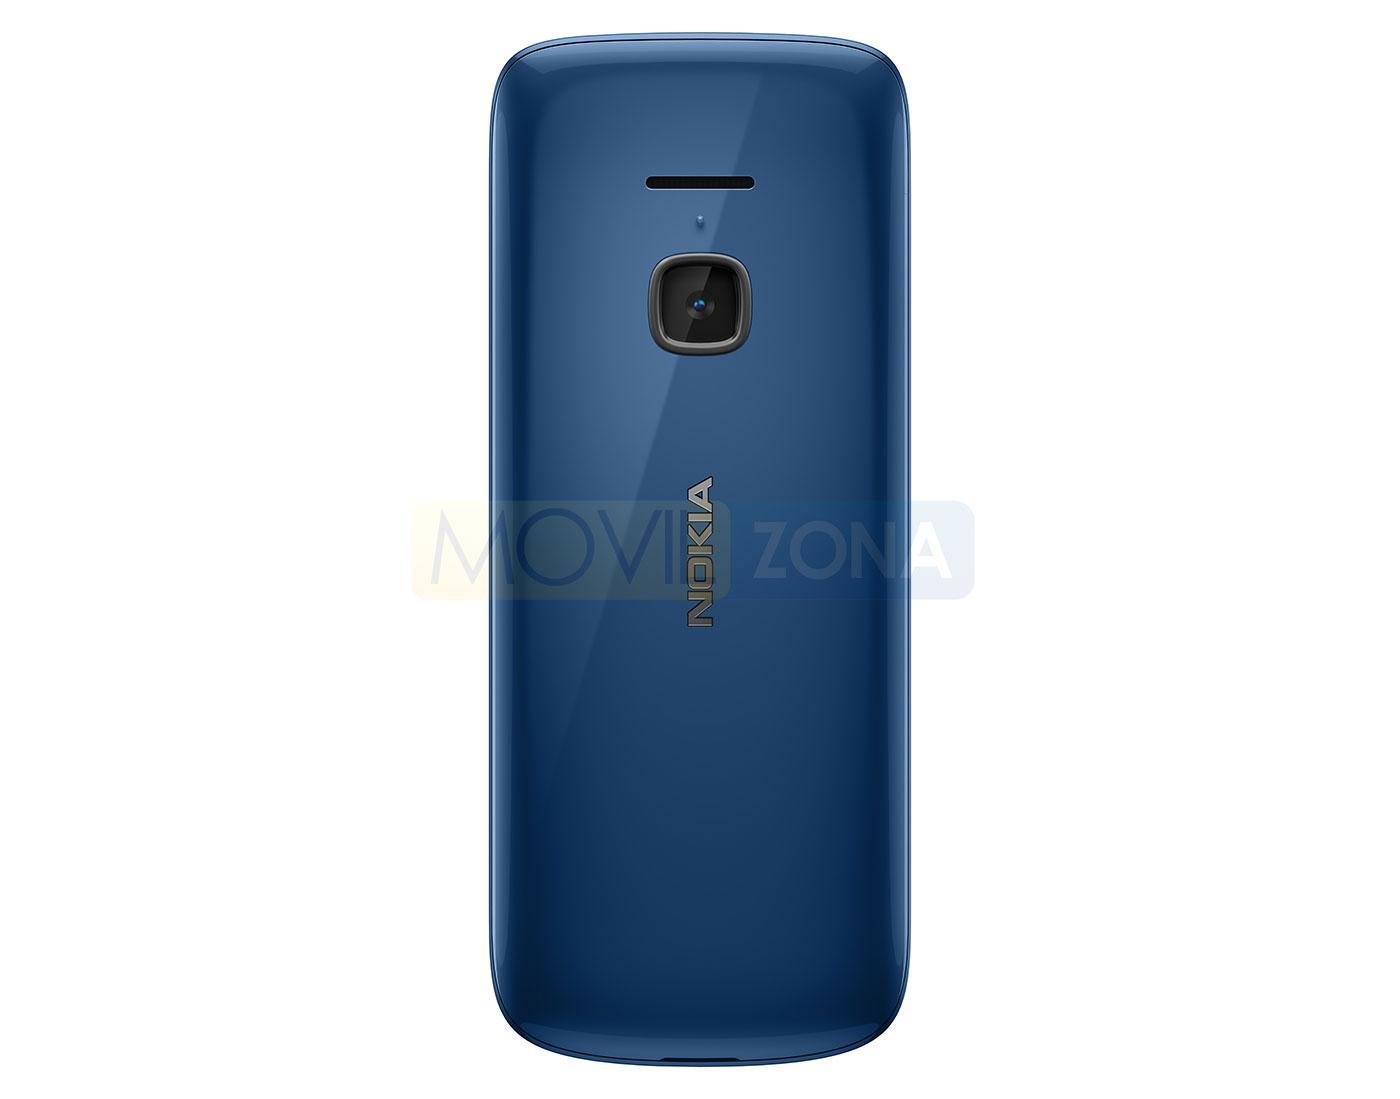 Nokia 225 4G cámara